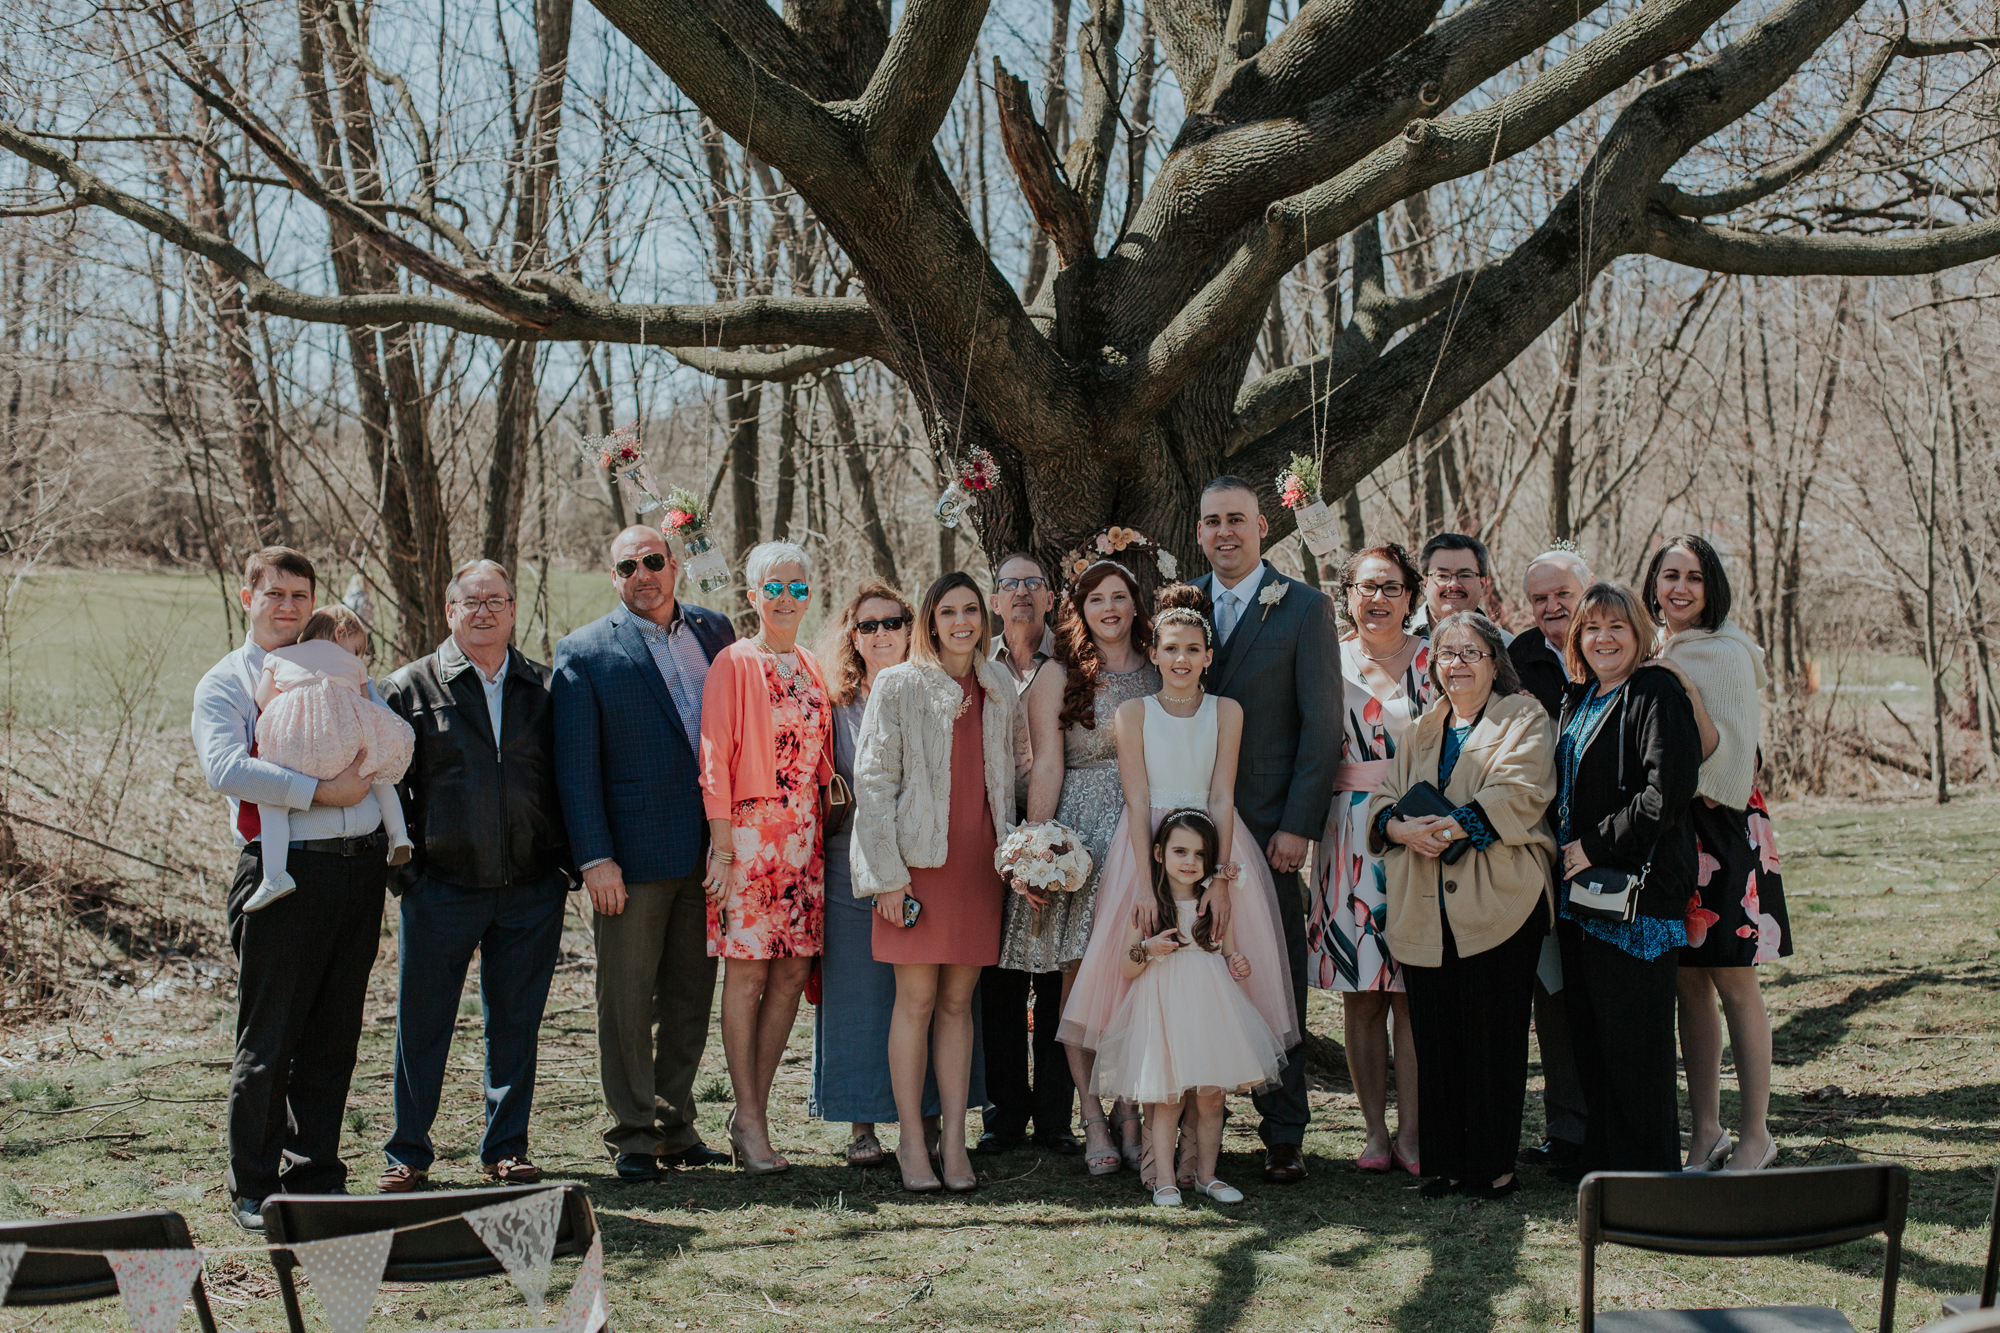 palmer-pennsylvania-family-formal-wedding-photography